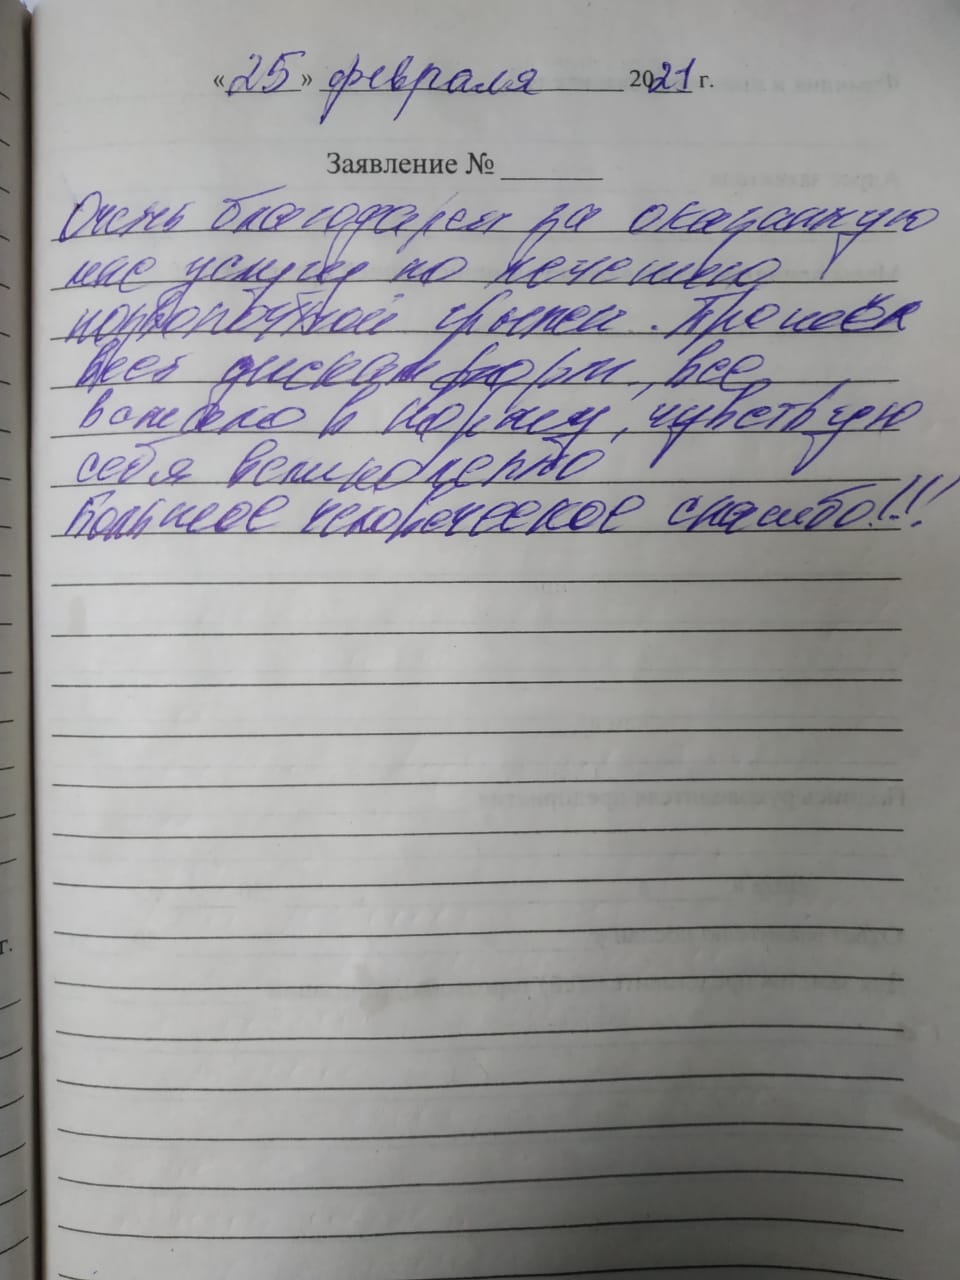 Карташов Александр Николаевич отзыв